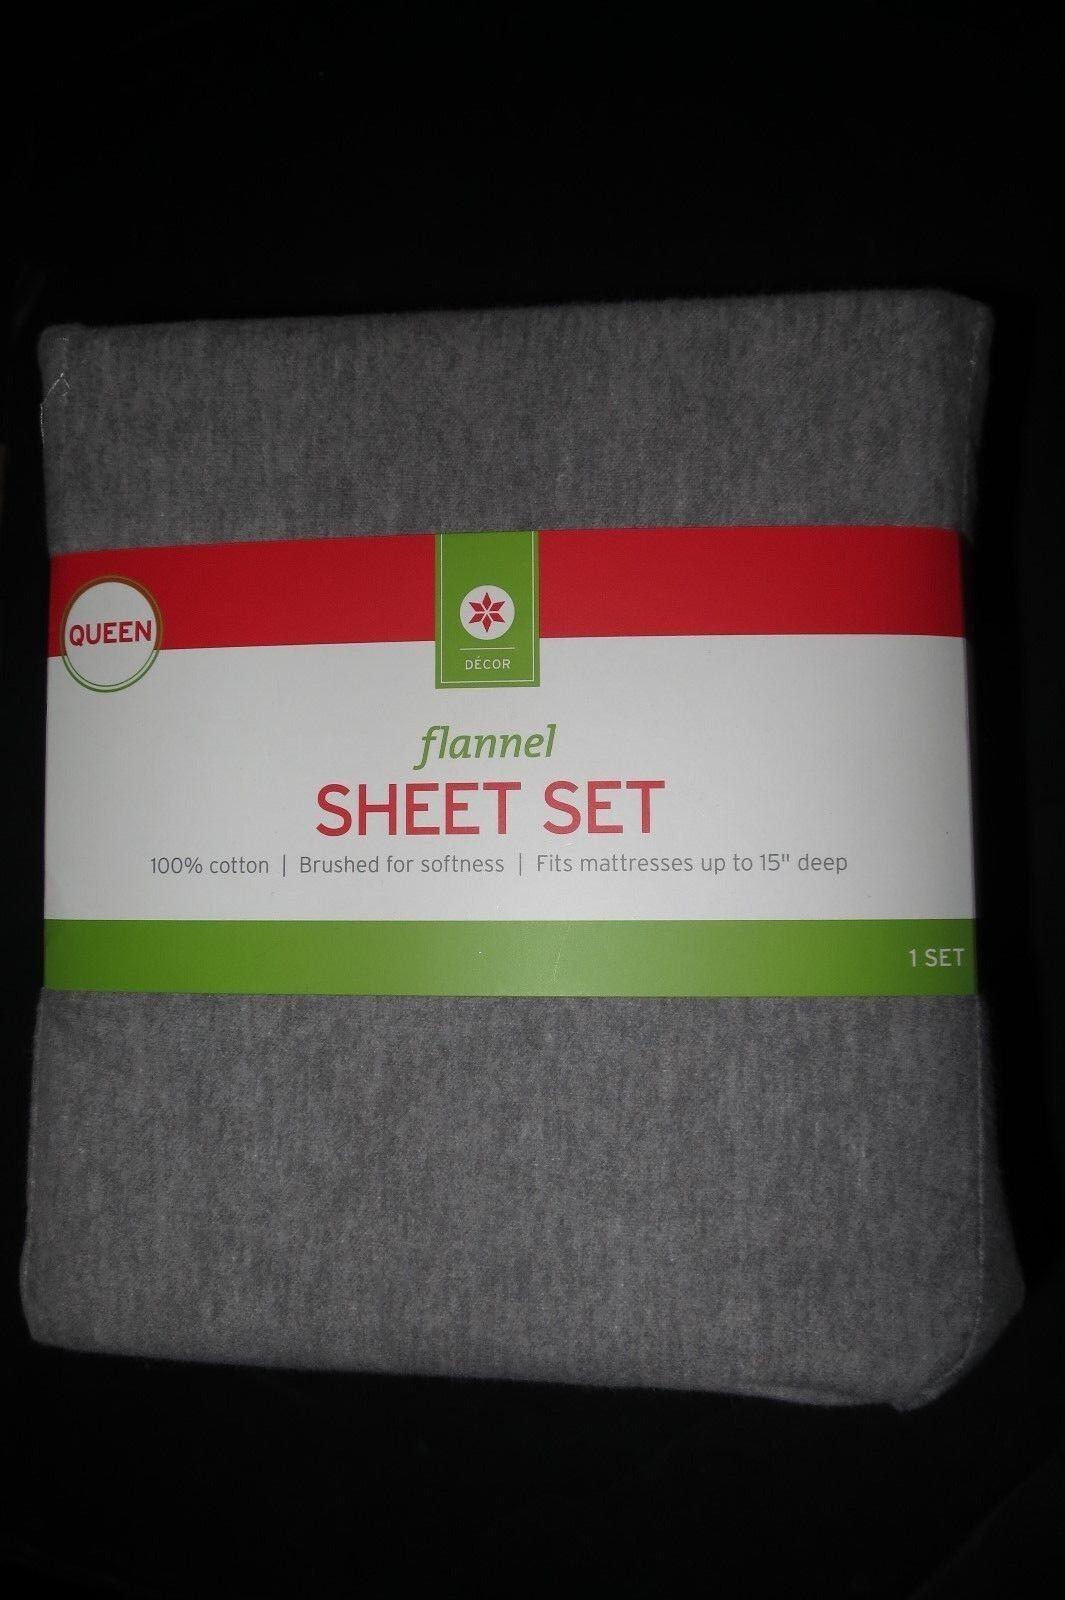 Evergreen Decor Target Flannel Sheet Set Solid Grey Queen Size For Sale Online Ebay